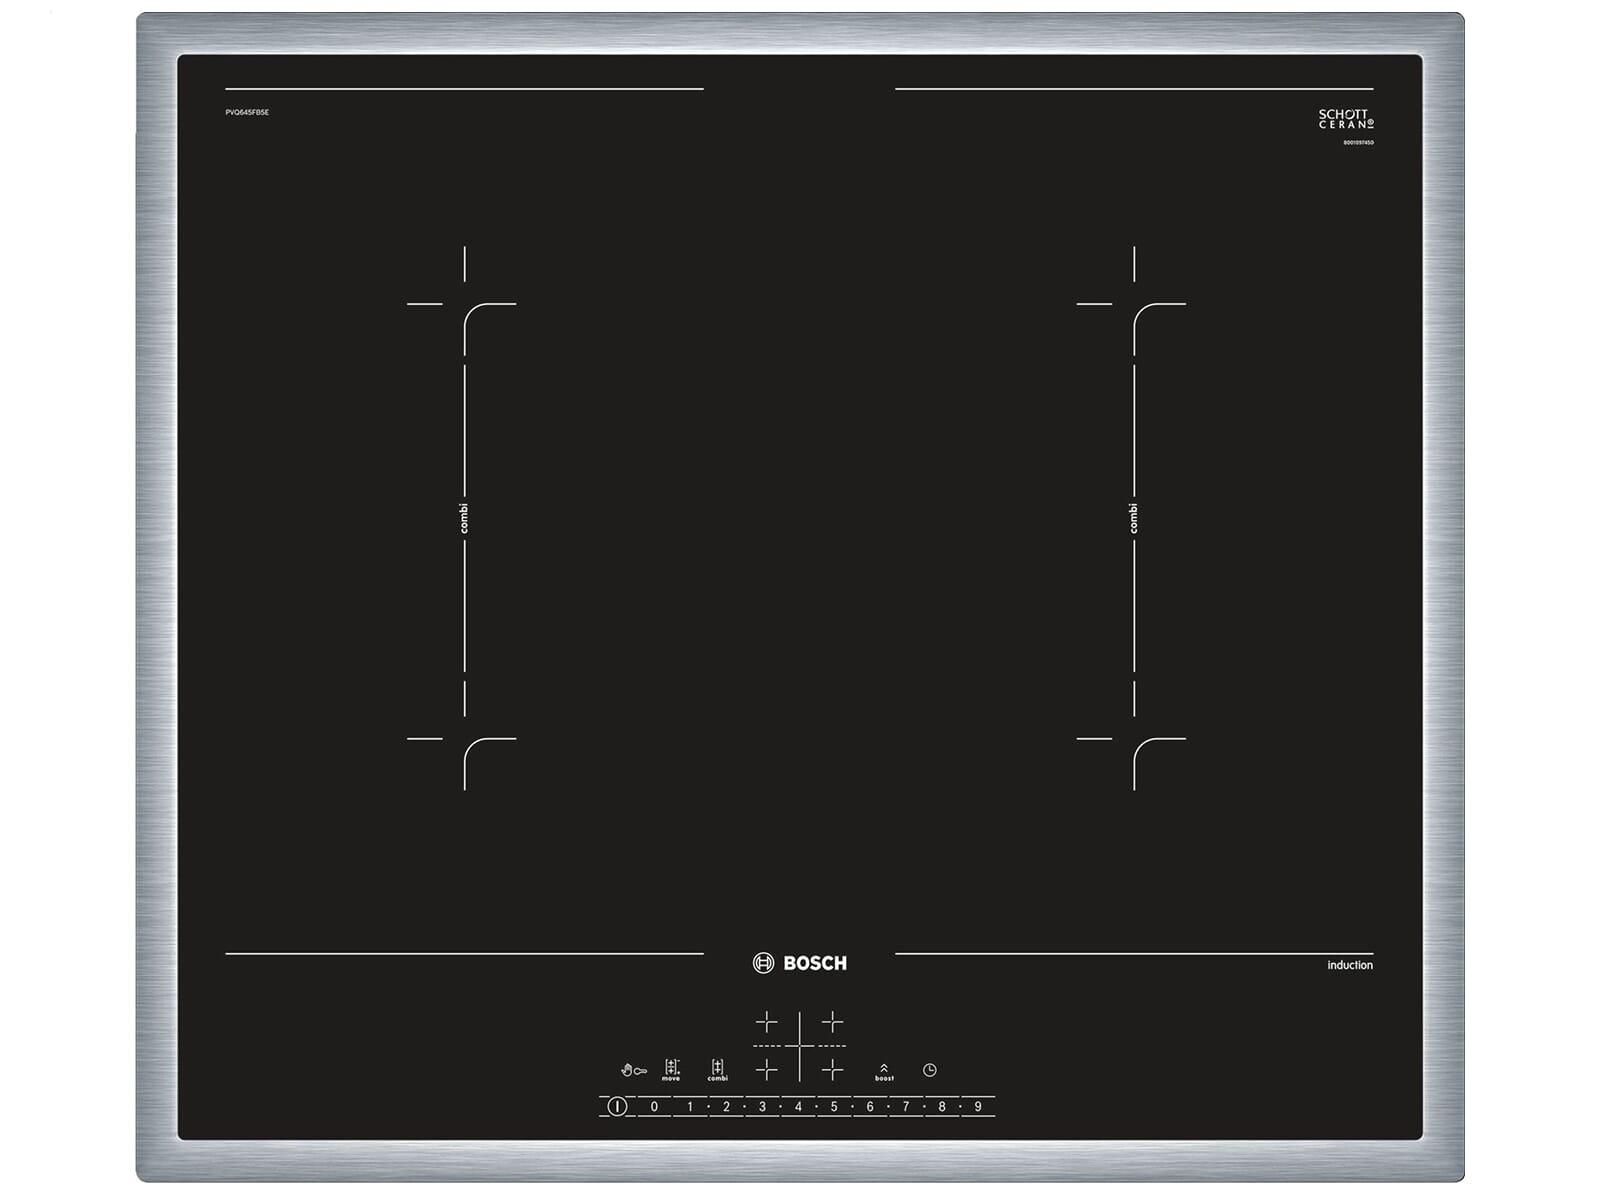 Siemens HB674GBS1 Pyrolyse Backofen Edelstahl + Bosch